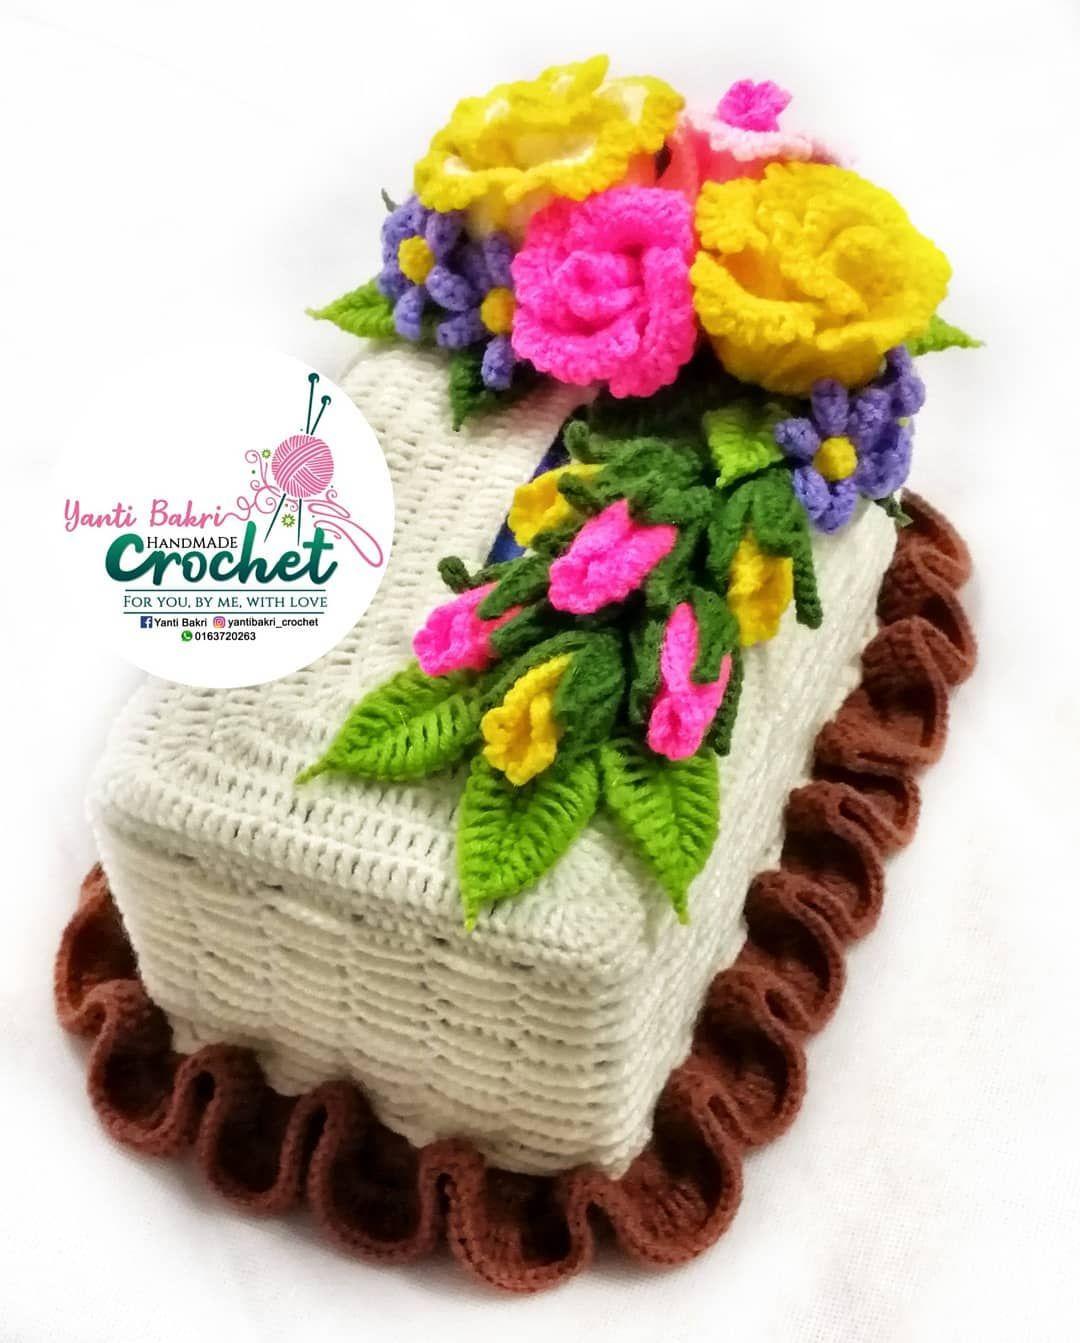 Kotak Tissu : kotak, tissu, ✨SARUNG, KOTAK, /TISU, COVER✨, 👉100, Handmade, Crochet, 👉Materia, Crochet,, Knitted, Blankets,, Covered, Boxes